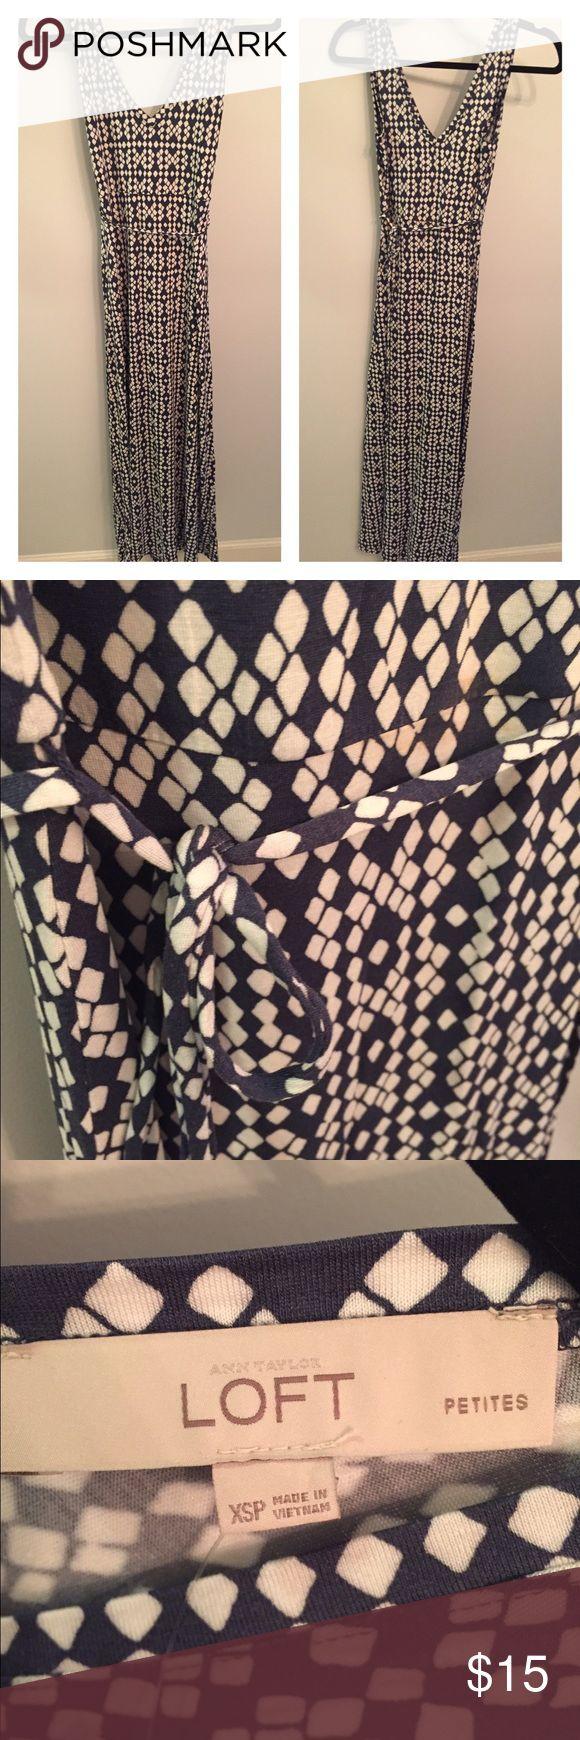 LOFT Cotton Maxi Dress NWT! Cotton Maxi dress in fun navy and white pattern. LOFT Dresses Maxi